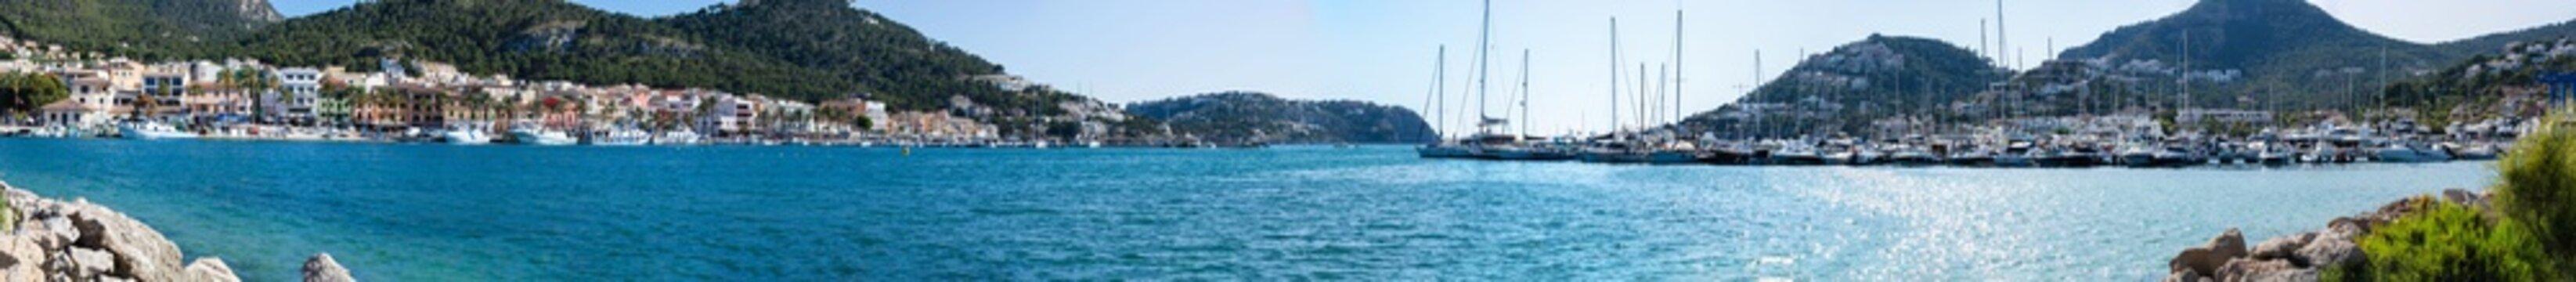 Bay and harbor Port de Andratx, Mallorca, Spain